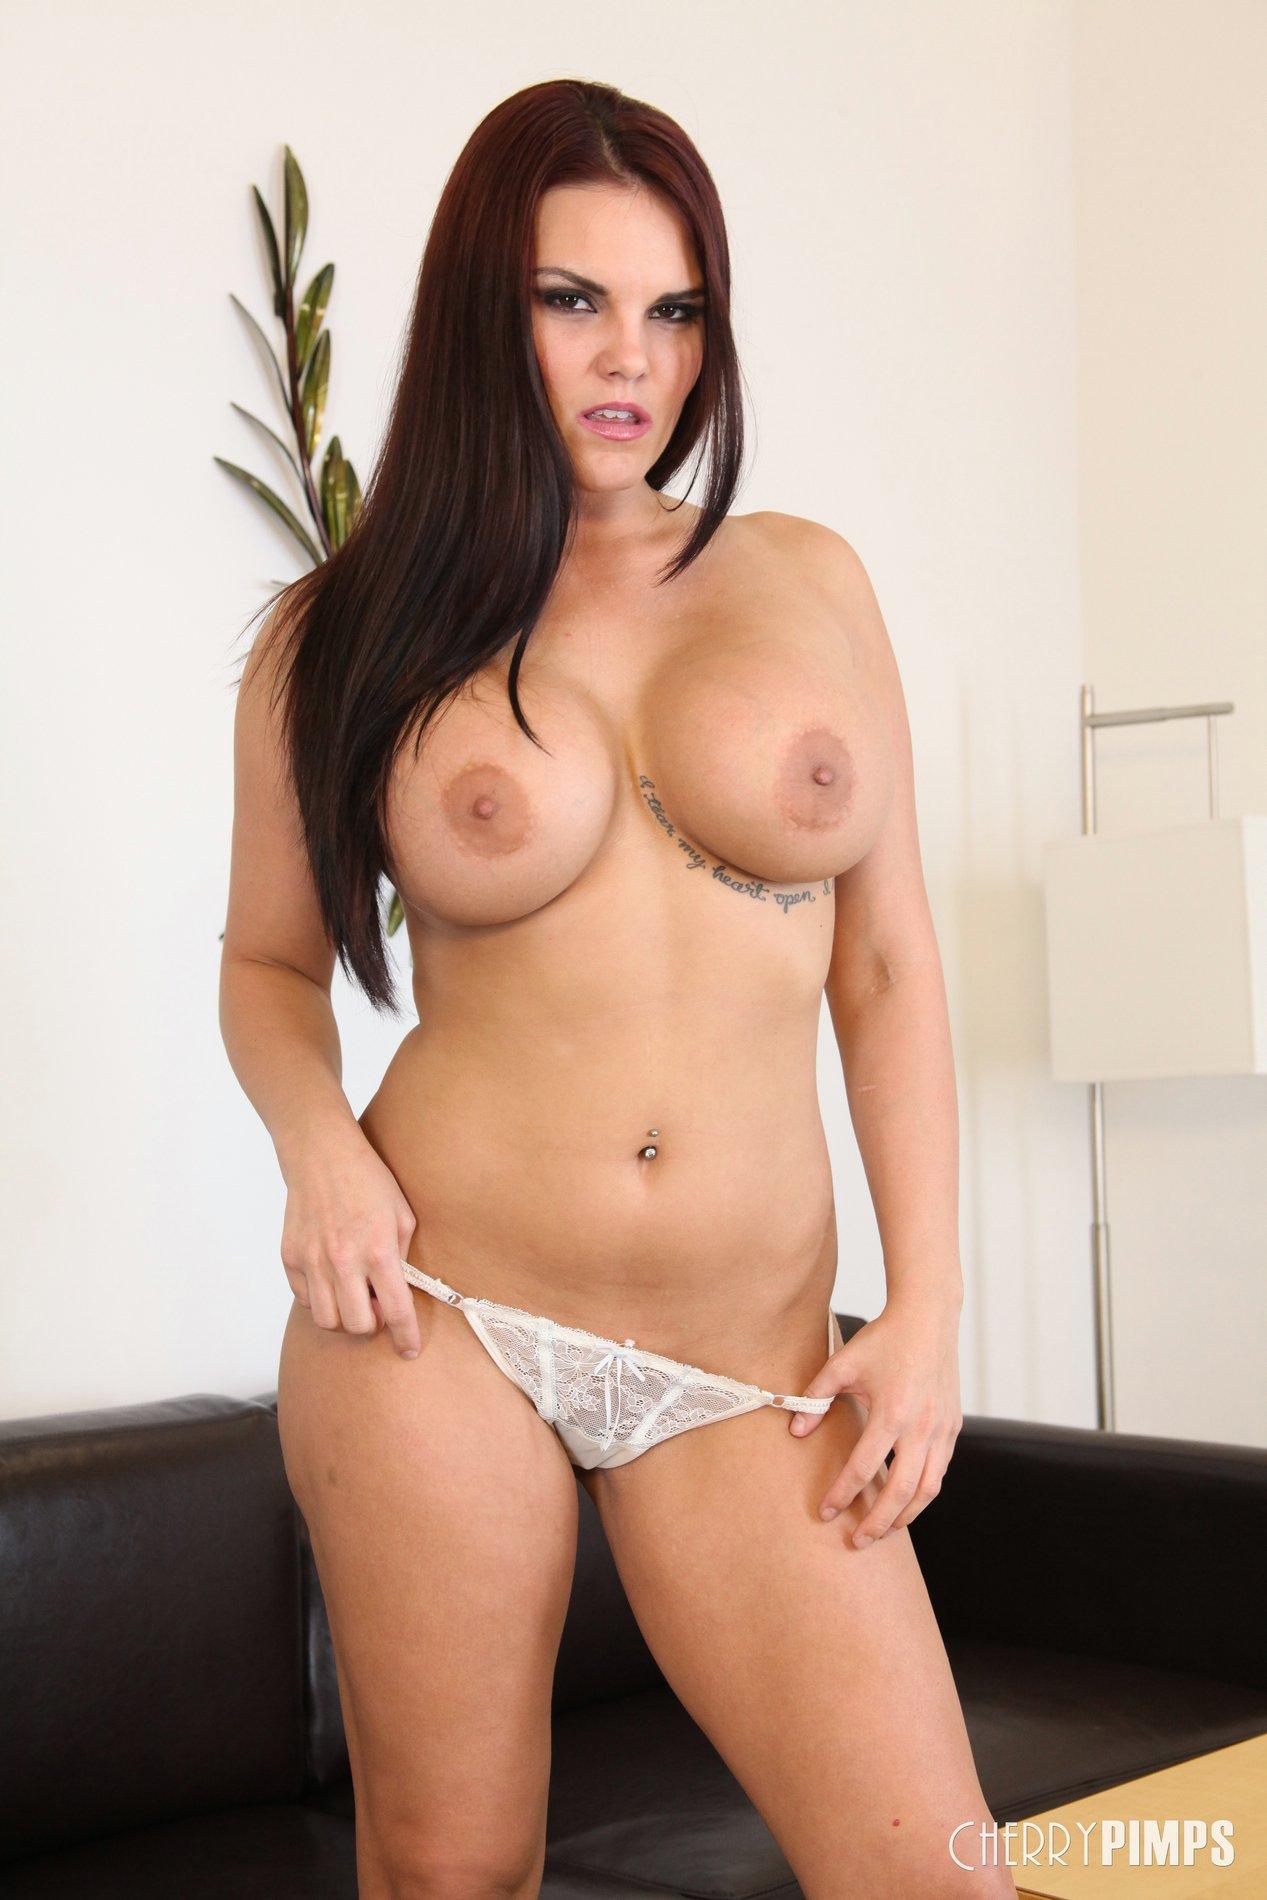 mackenzee pierce strips and shows off her sexy body - my pornstar book